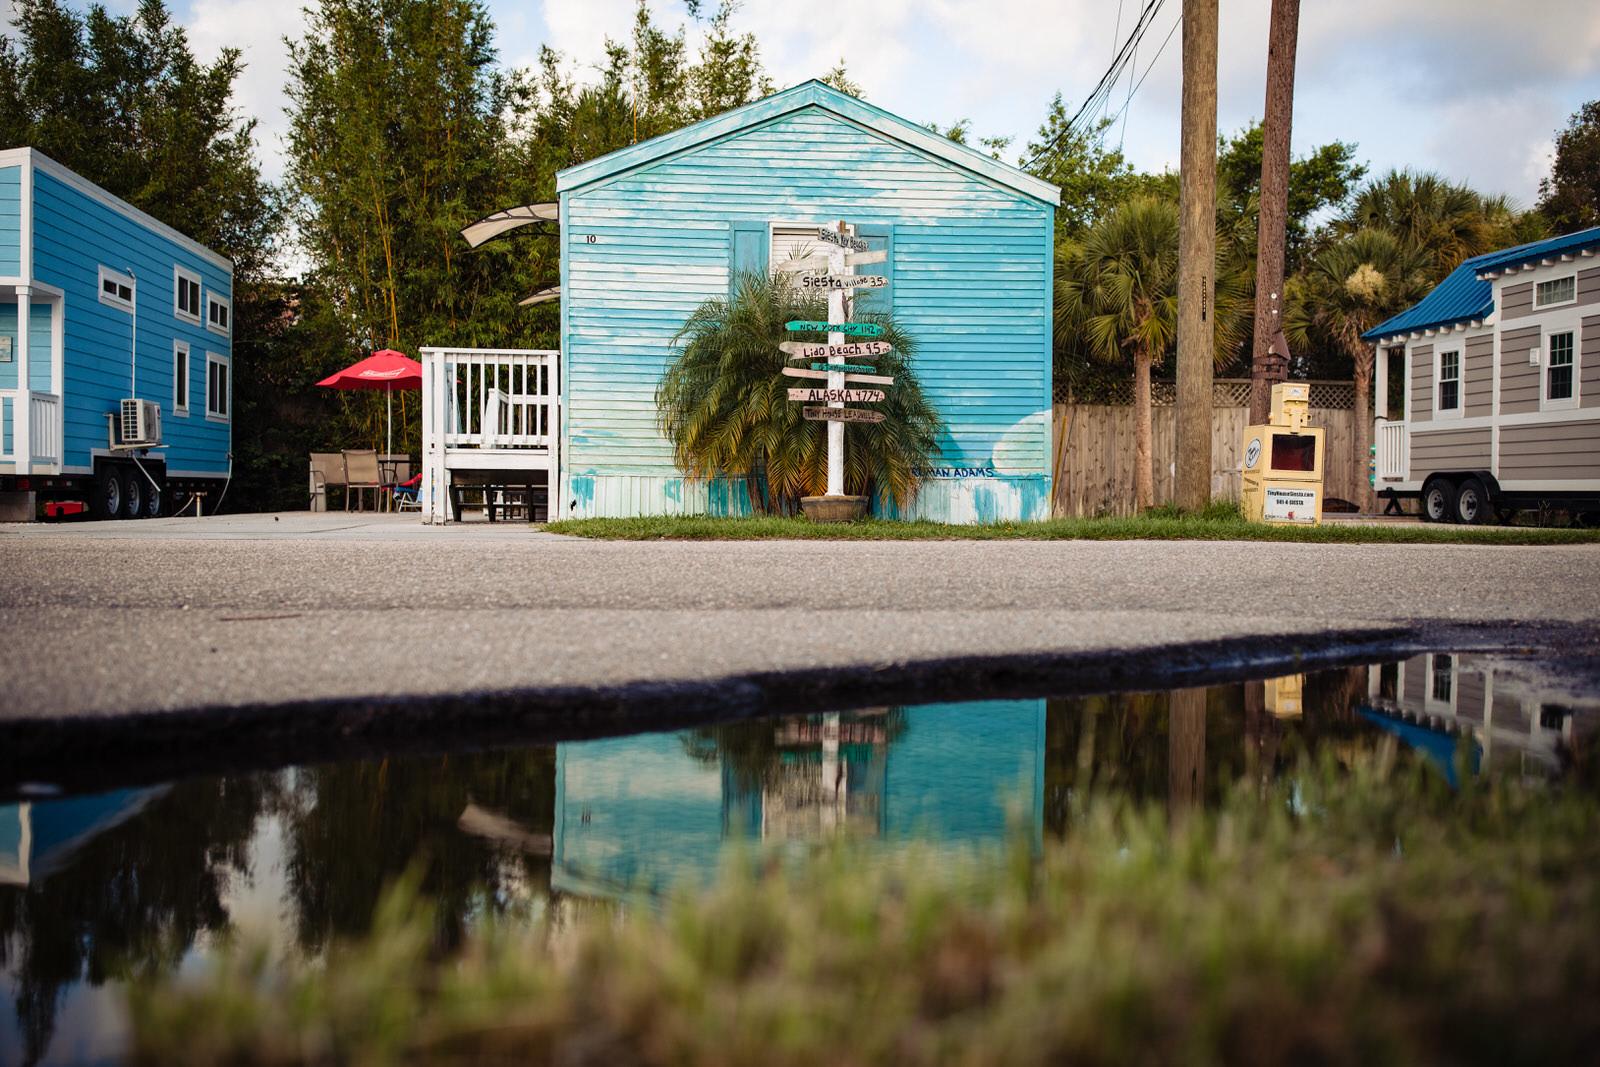 siesta-key-florida-tiny-house-photo-vacation-beach-nature-macro-8.jpg